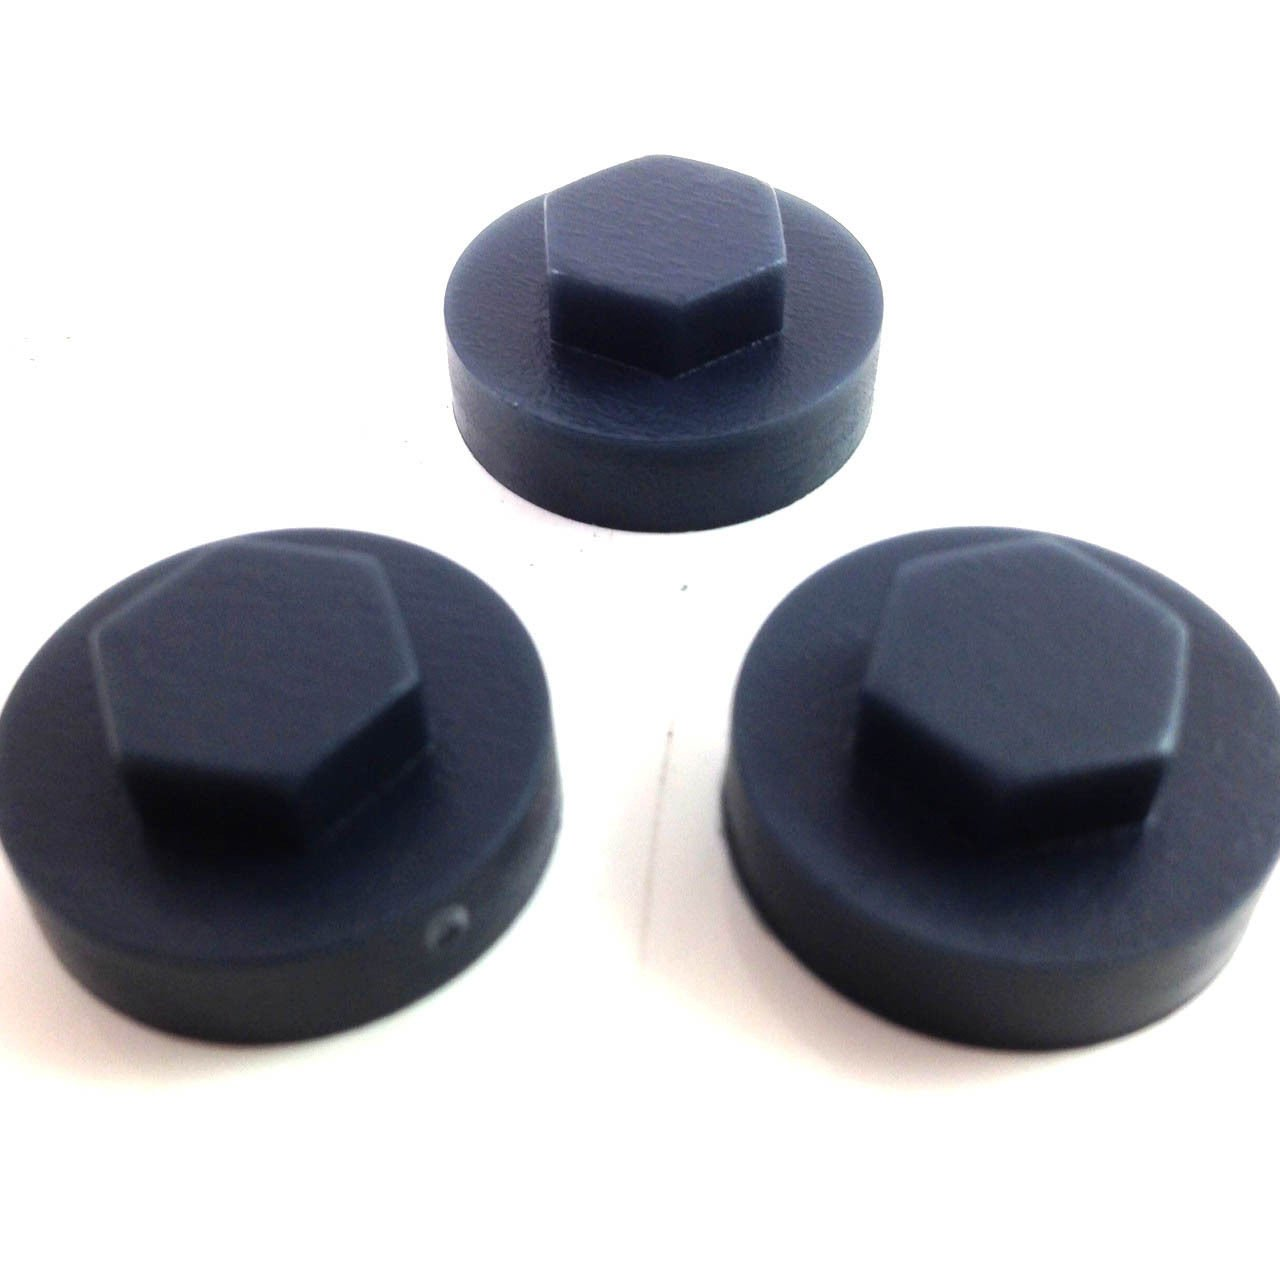 "16mm RAVEN BLUE HEXAGONAL TEK SCREW COVER CAPS TO FIT 8mm 5//16/"" TEK SCREWS"